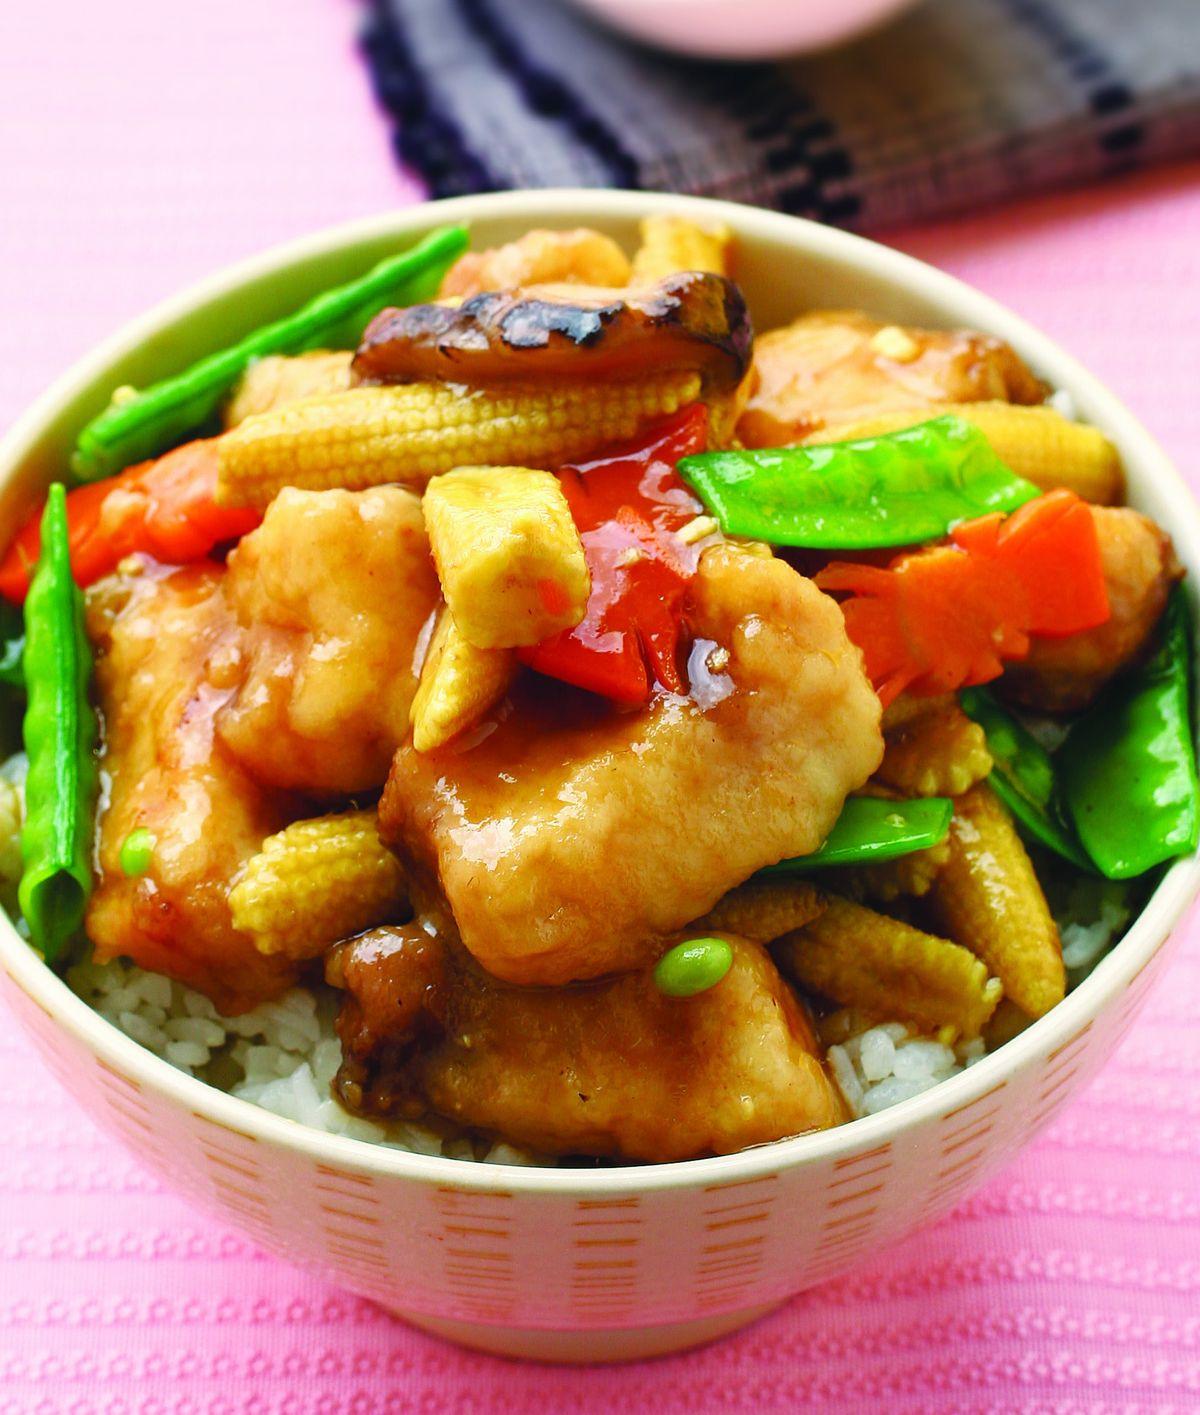 【食譜】紅燒魚腩蓋飯:www.ytower.com.tw